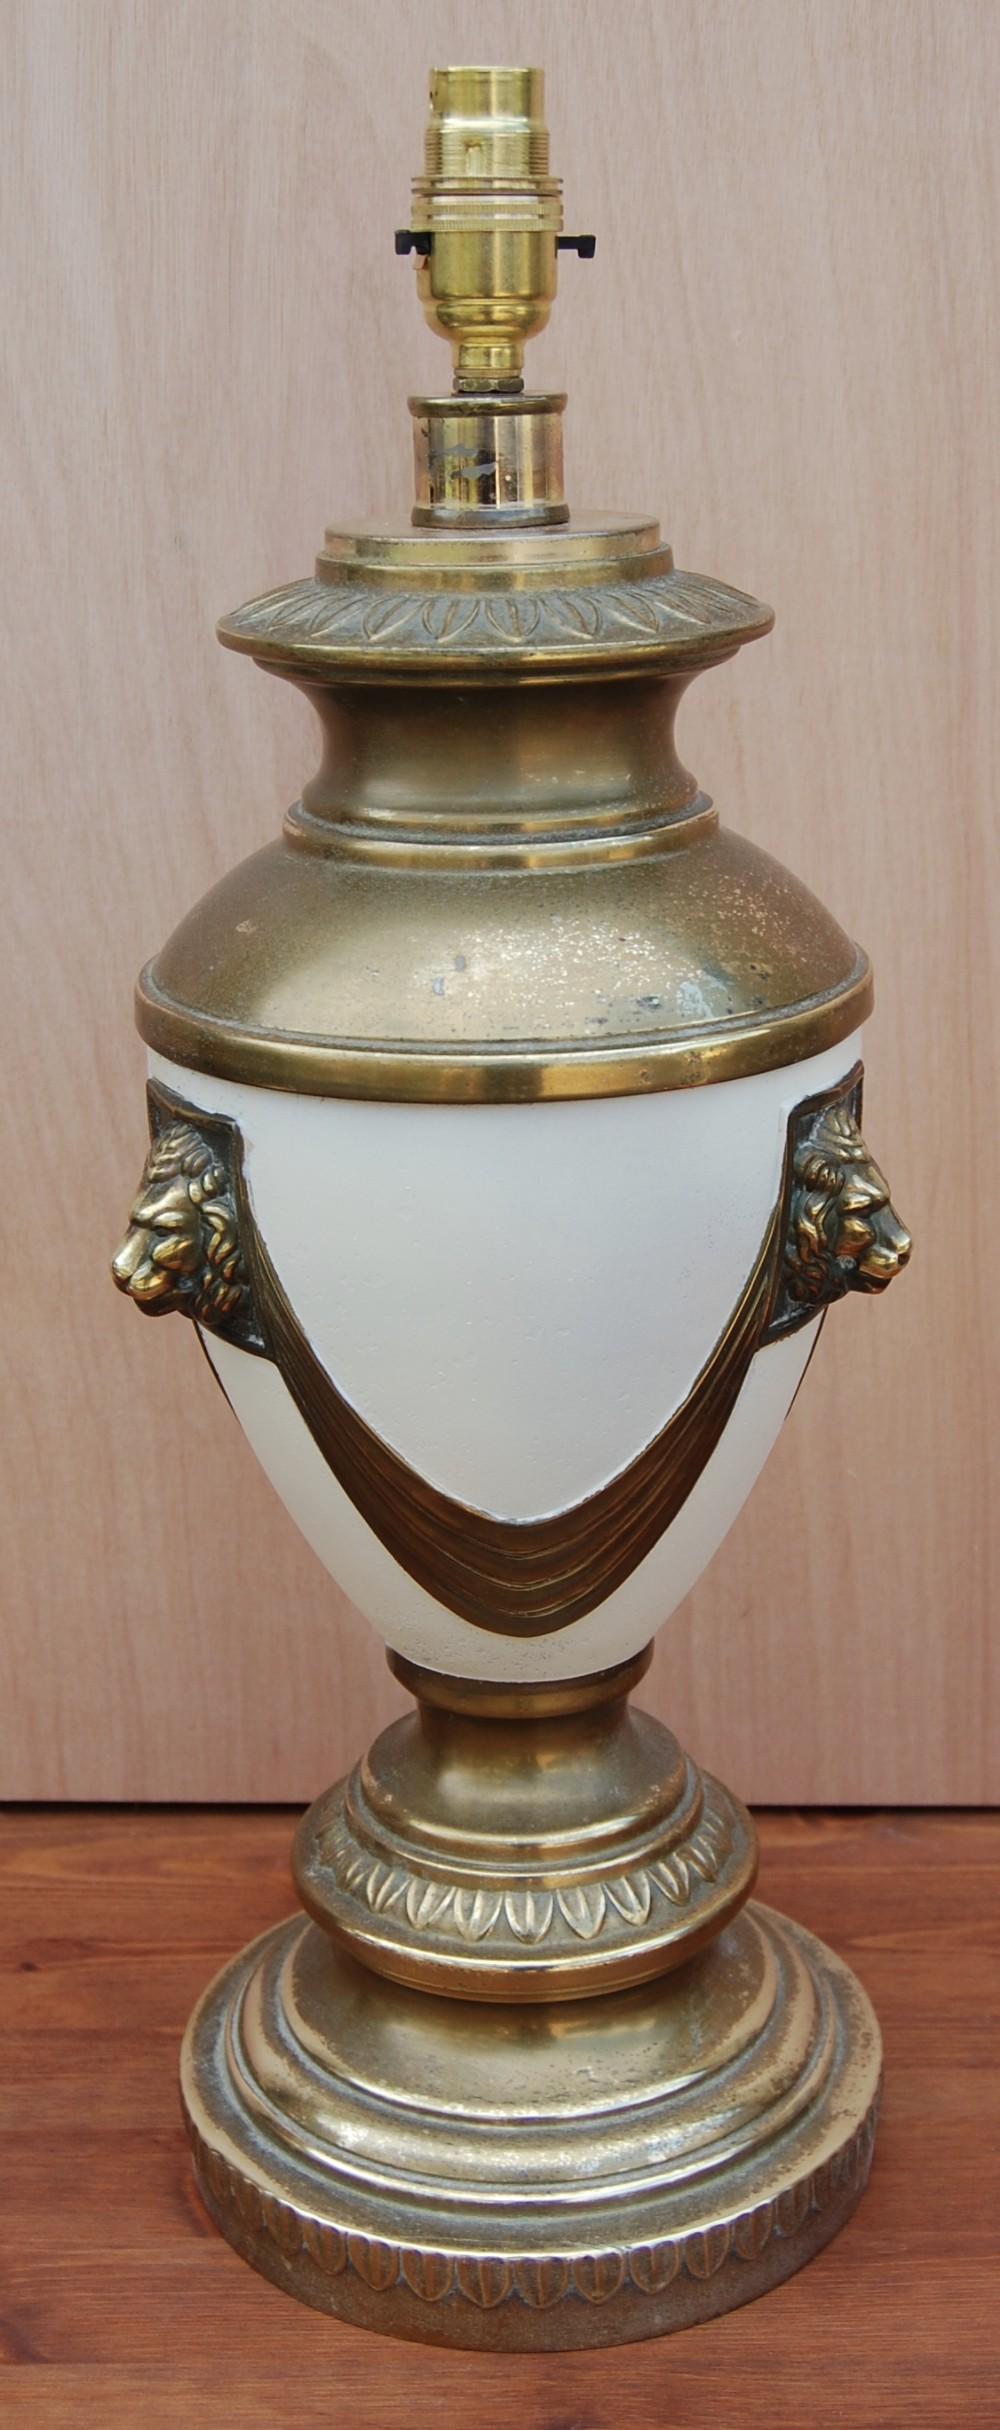 original single brass urn style lamp